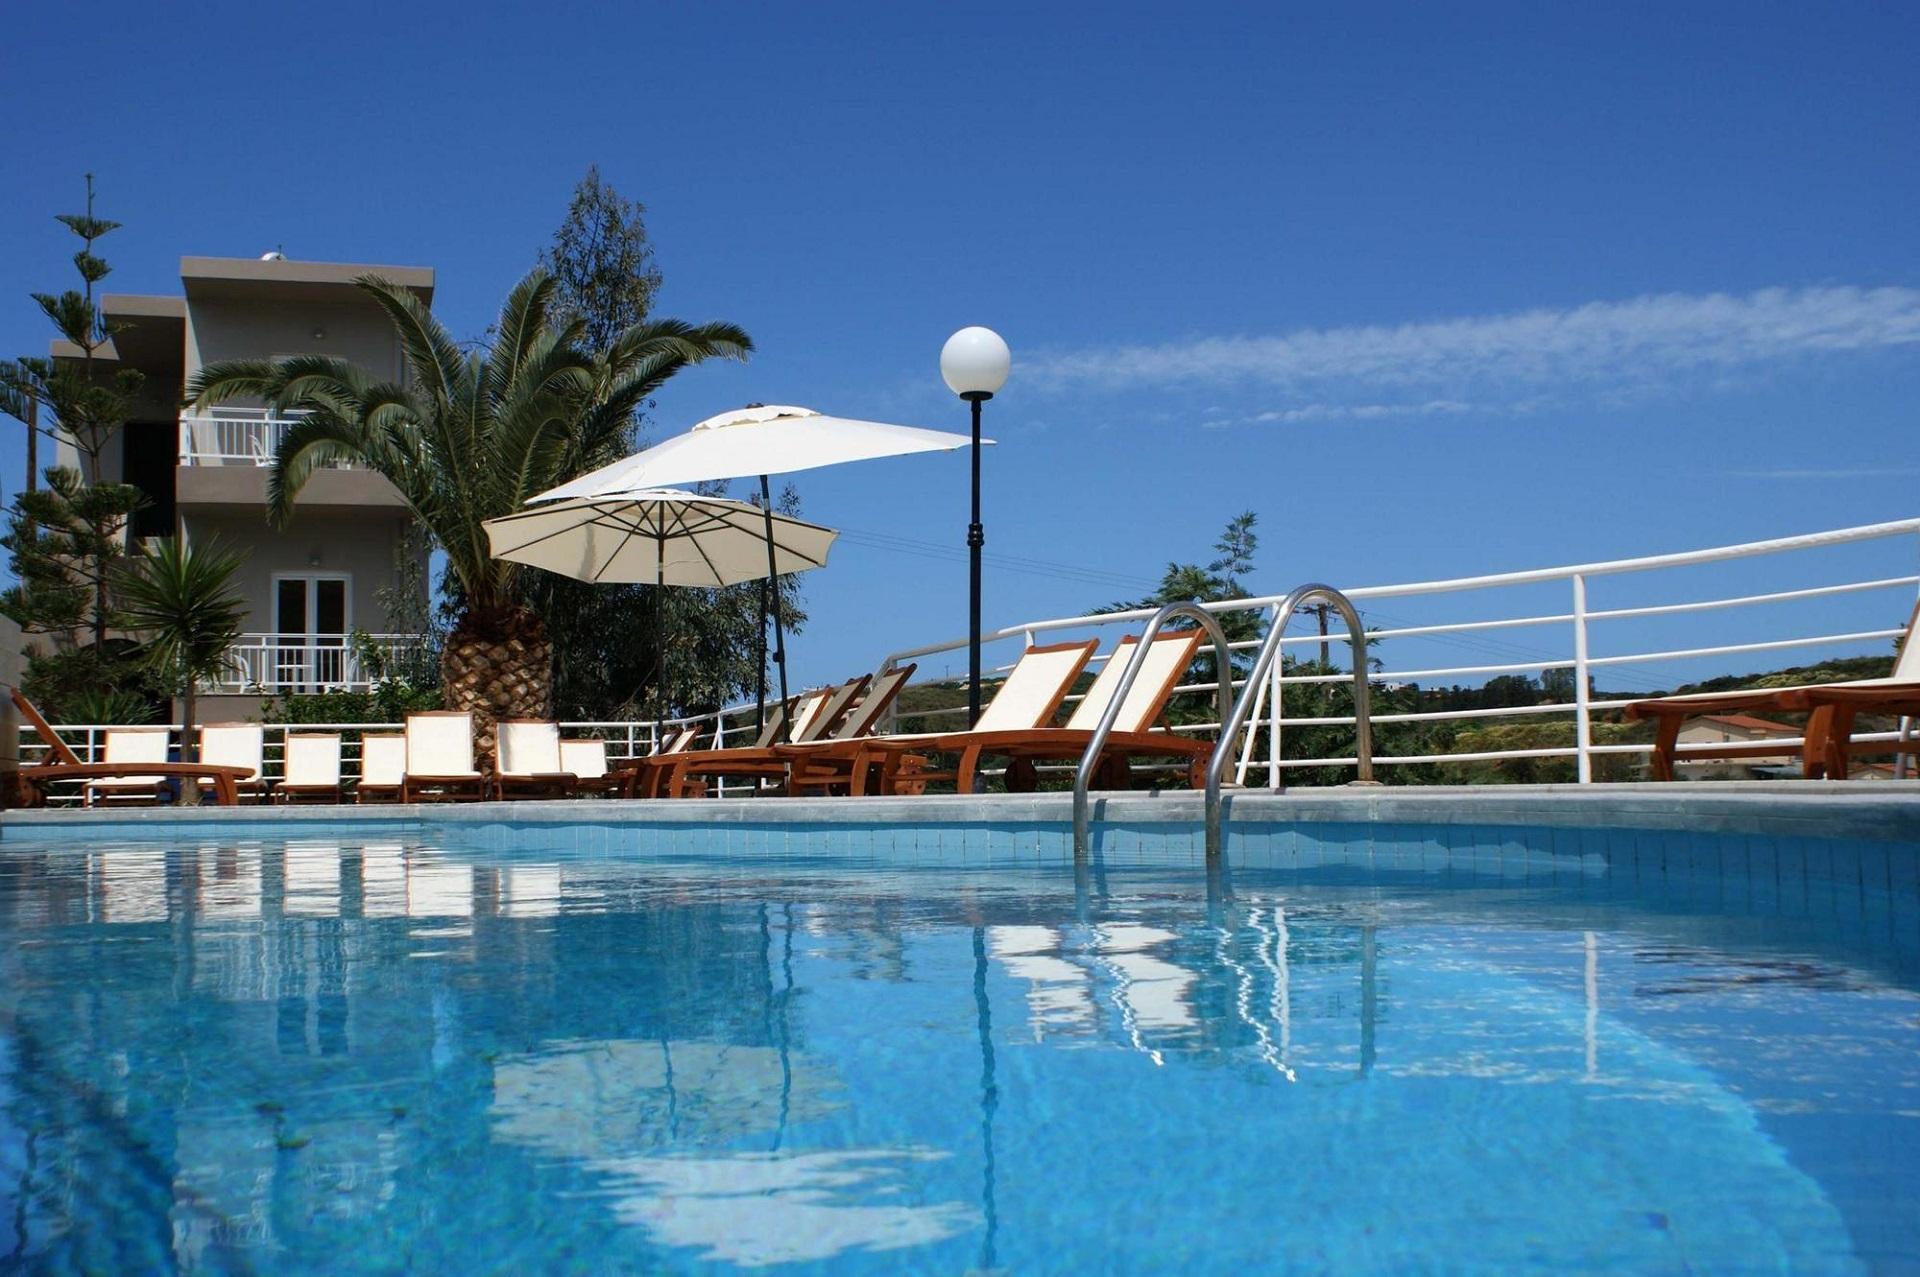 http://budavartours.hu/binaries/content/gallery/budavar/locations/accomodations/G%C3%B6r%C3%B6gorsz%C3%A1g/Agia+Pelagia/Pelagia+Bay+Hotel/pelagia-bay-hotel-kreta-gorogorszag-greece-crete-main.jpg